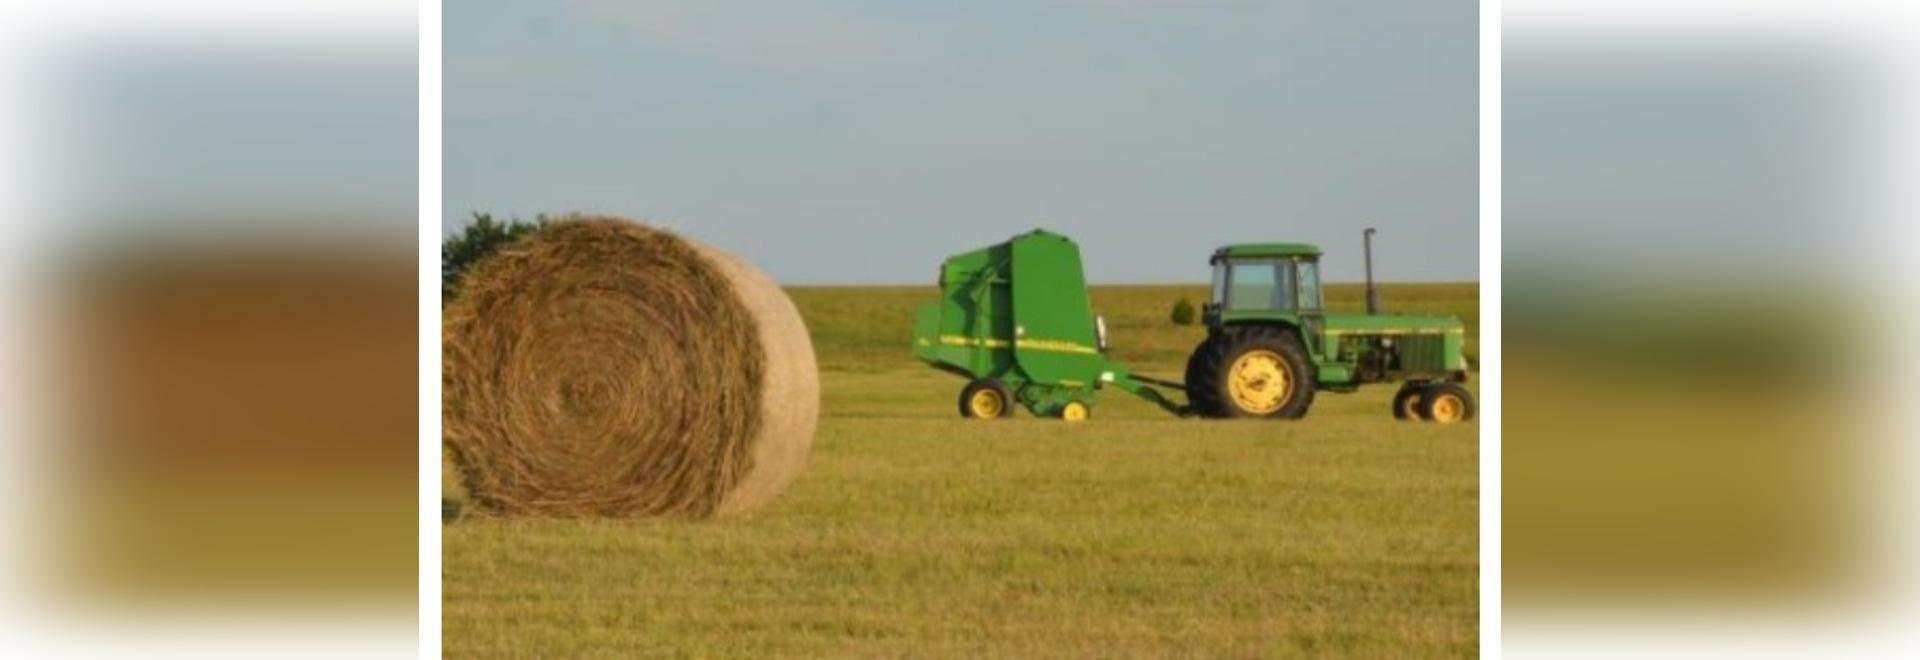 Safety Considerations for Hay Baling Season